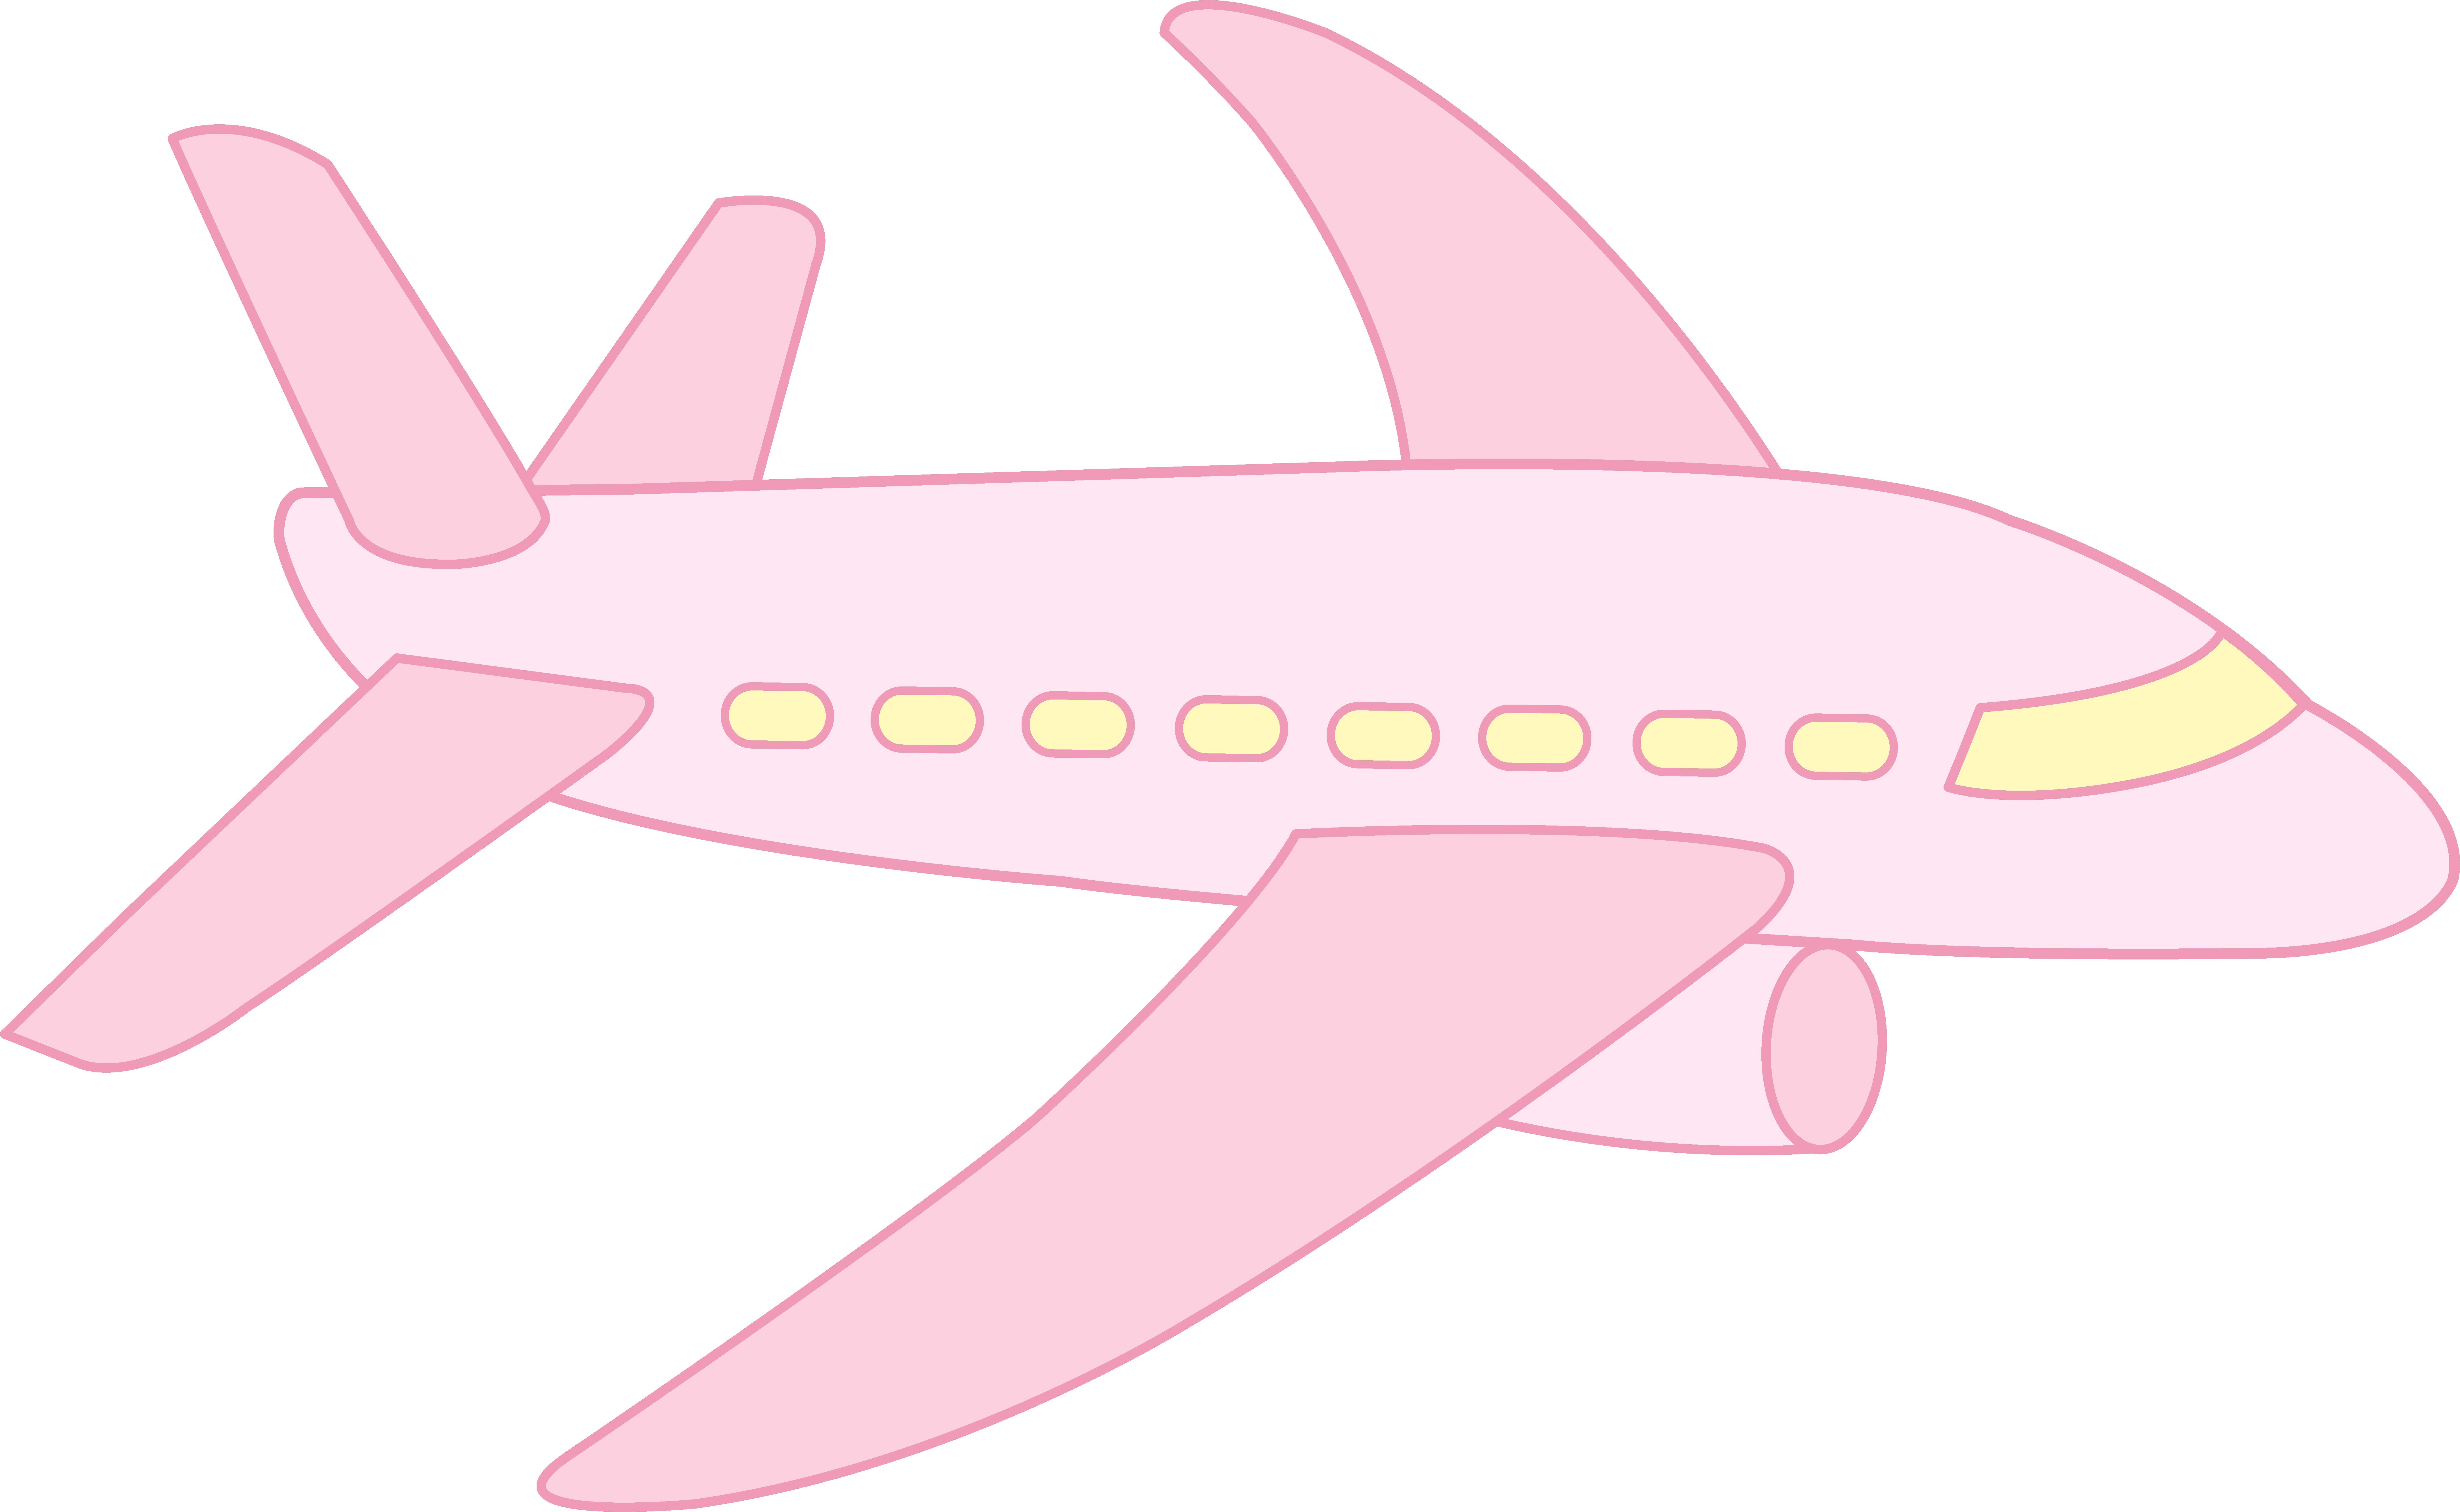 8669x5328 Jet Clipart Pink